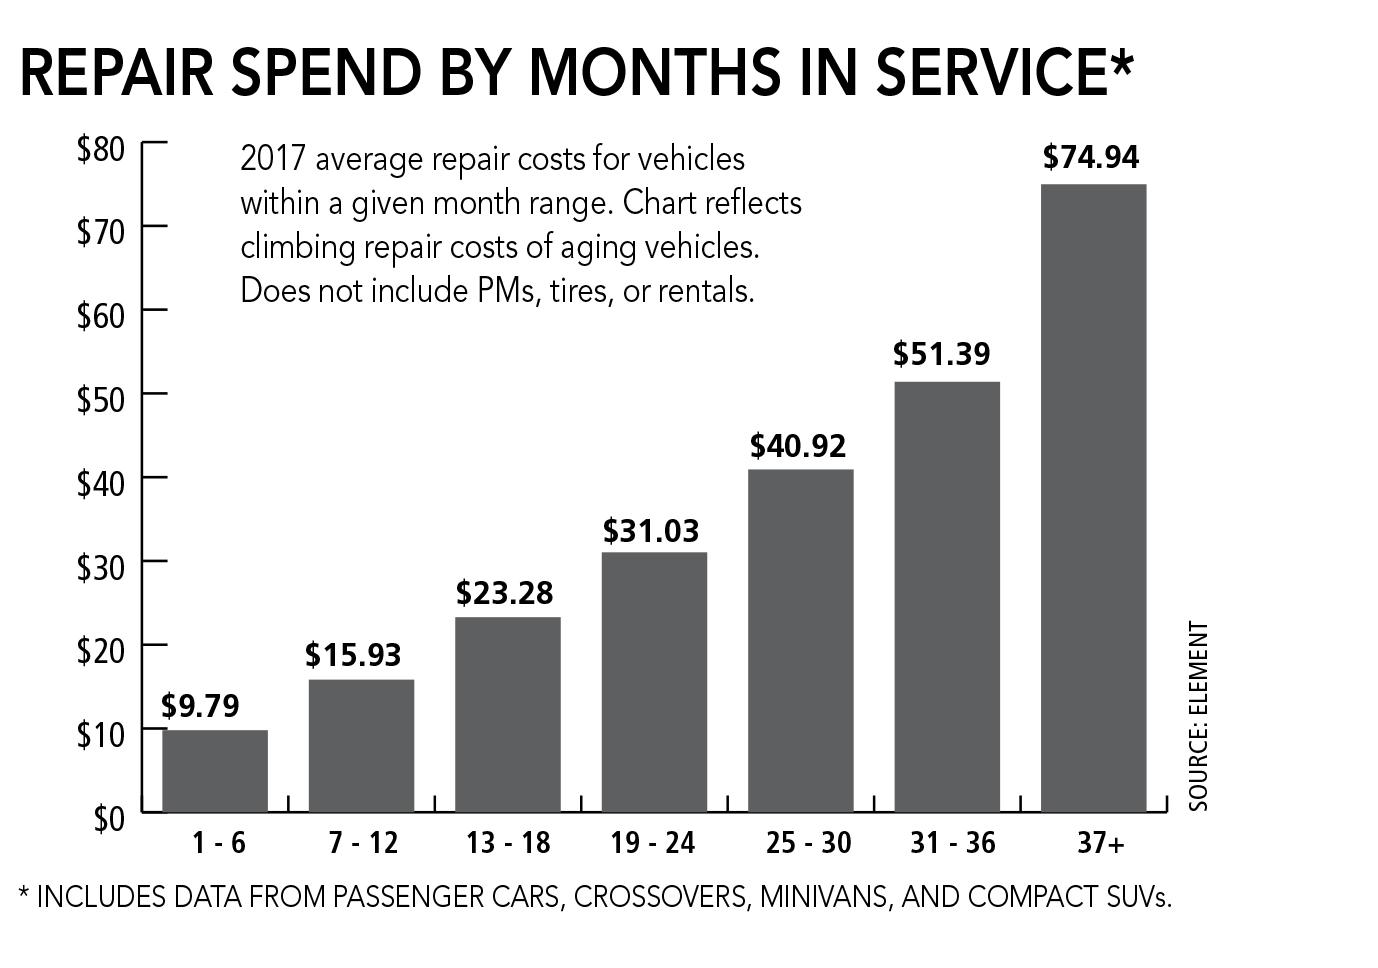 Fleet Preventive Maintenance Costs Increase 3%